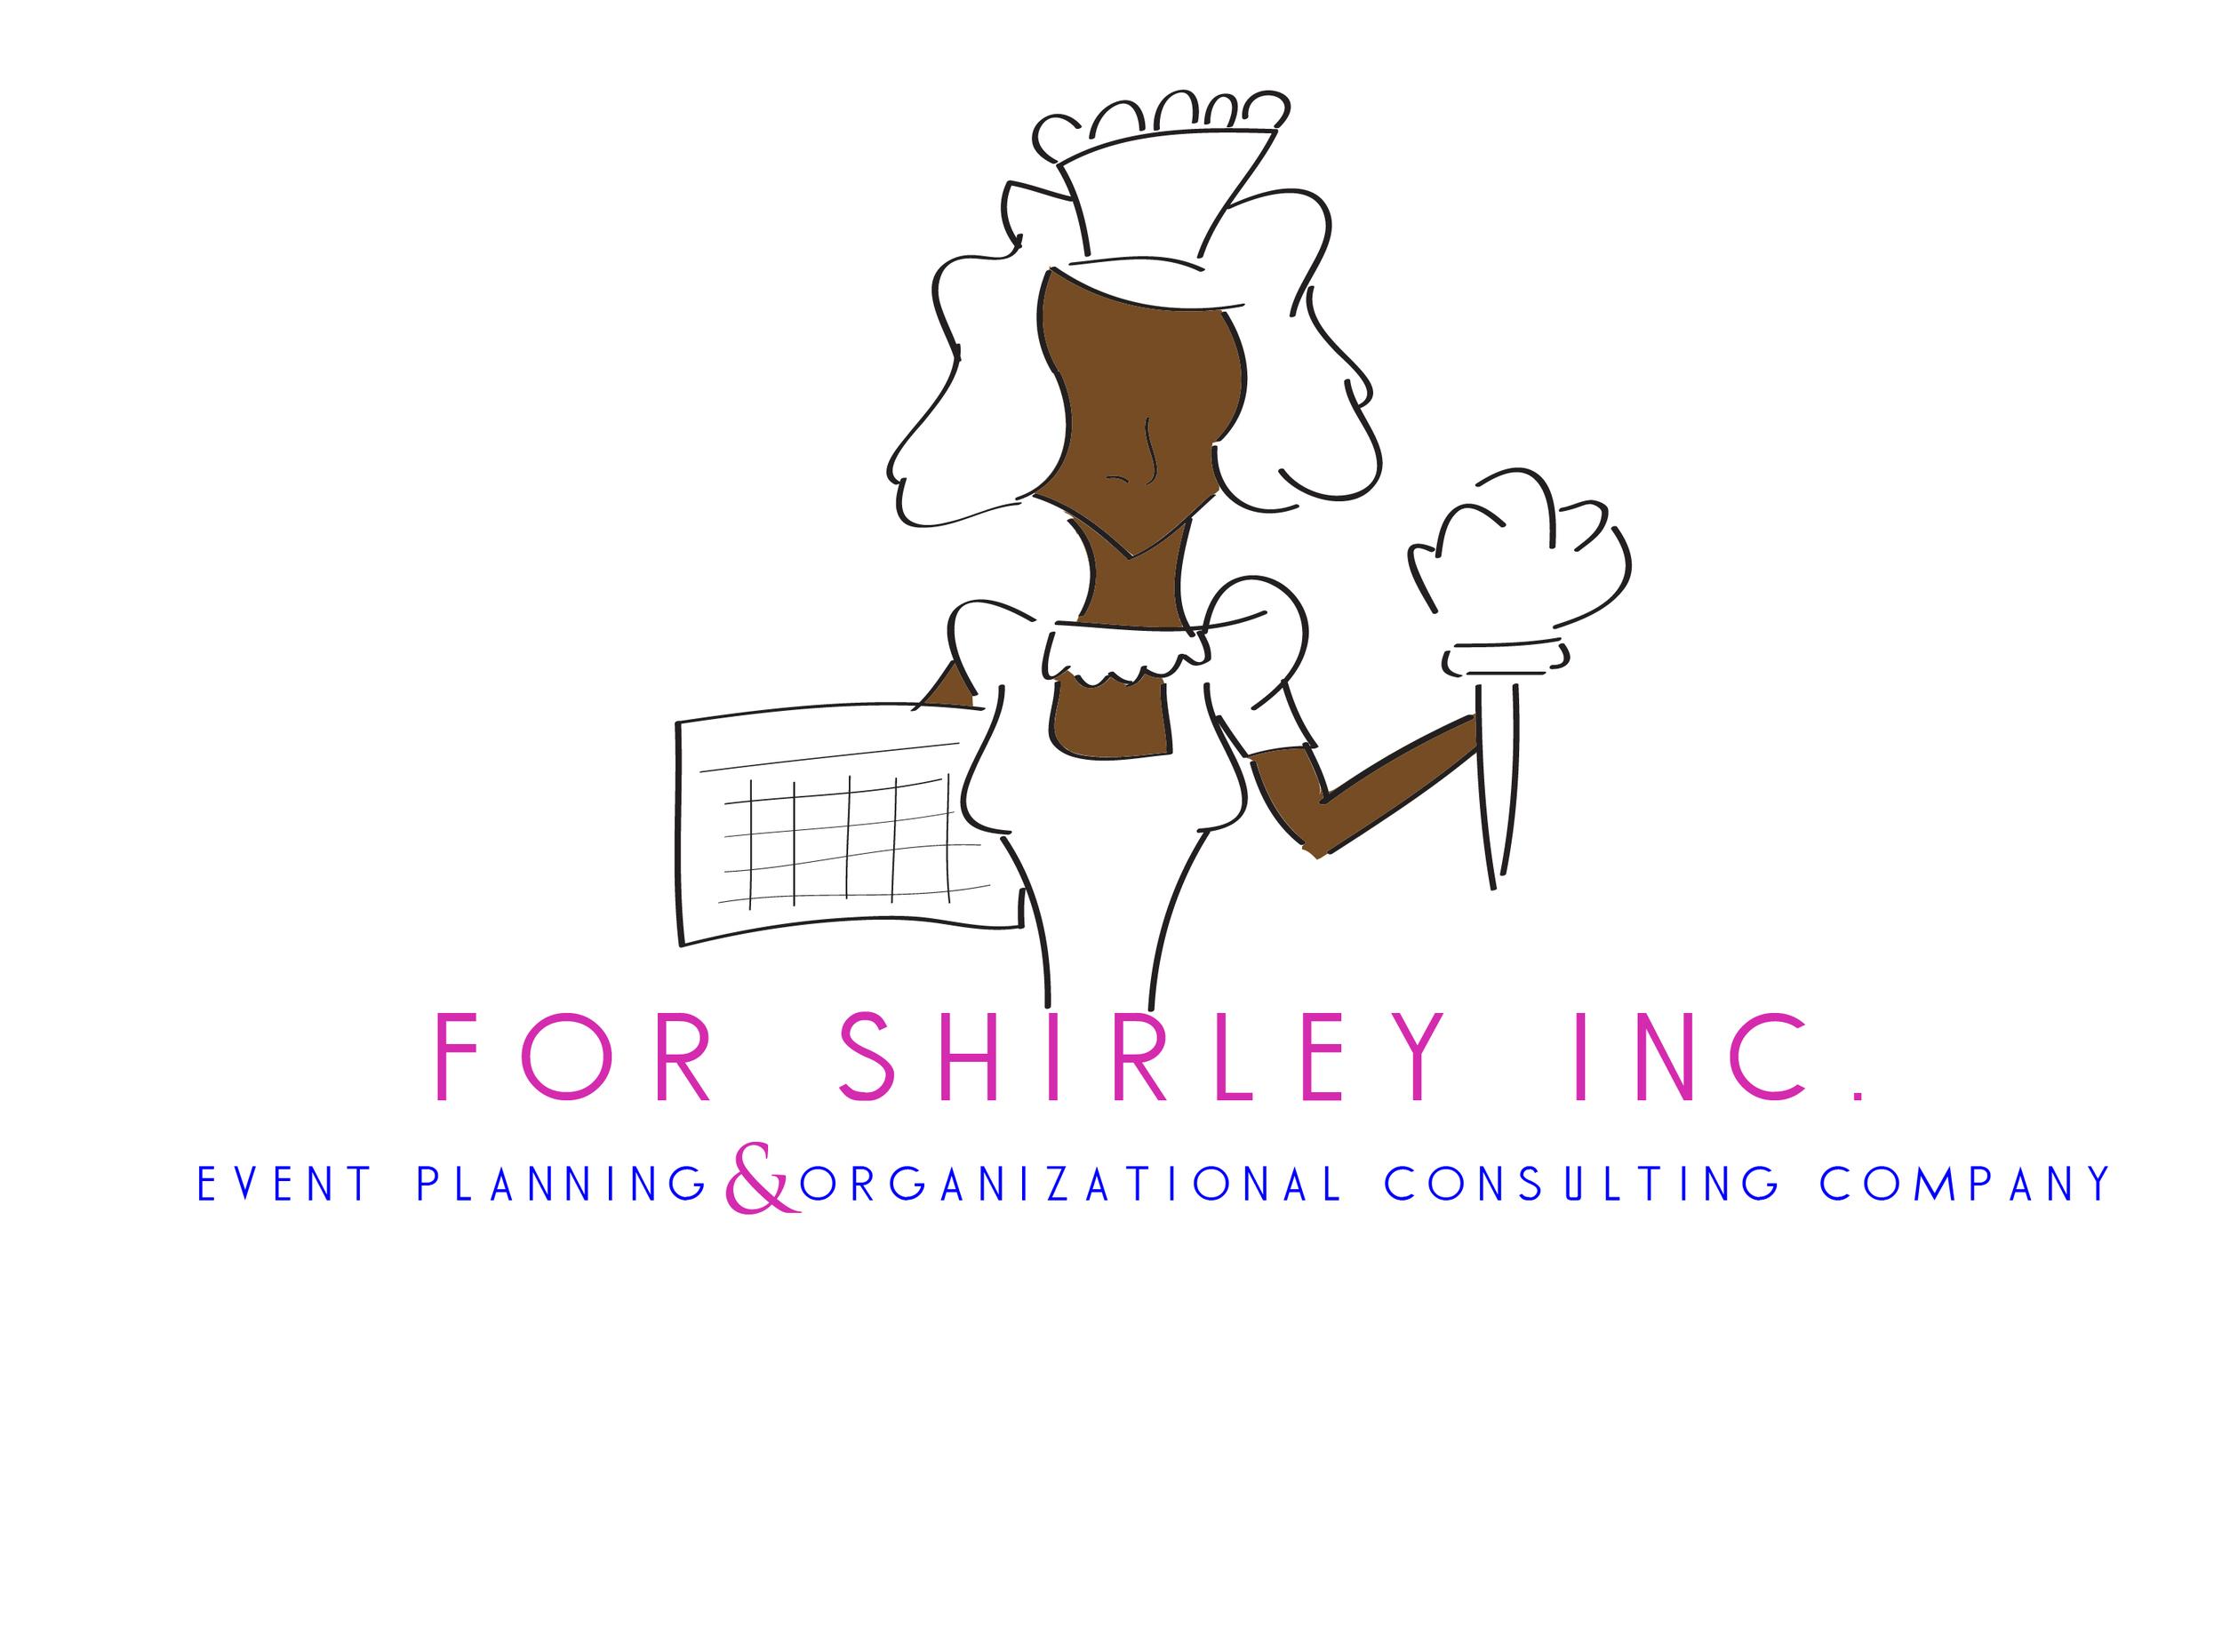 For Shirley Maid.jpg